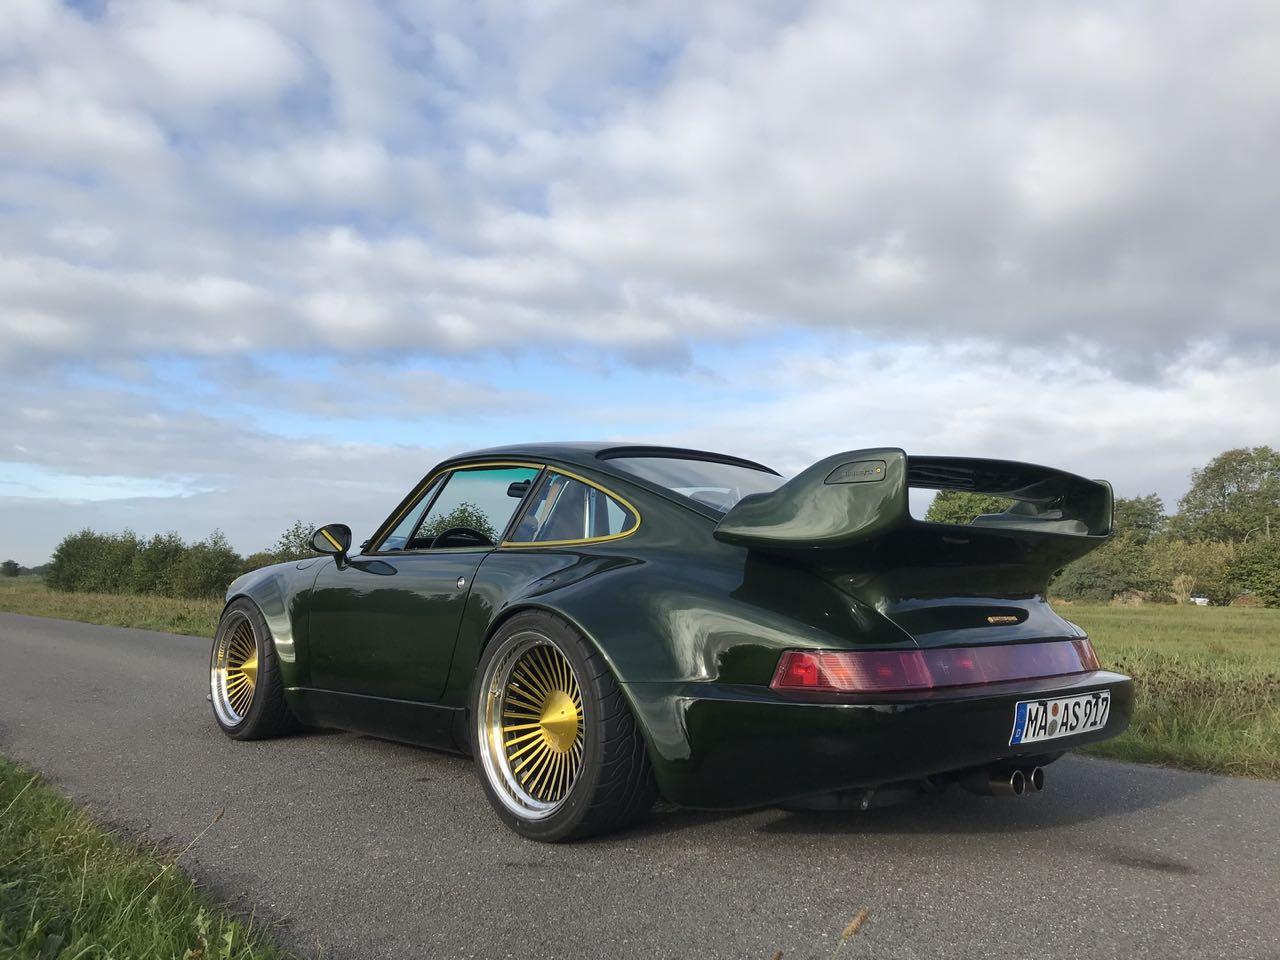 '93 Porsche 965 Turbo Wagenbauanstalt... custom ! 38